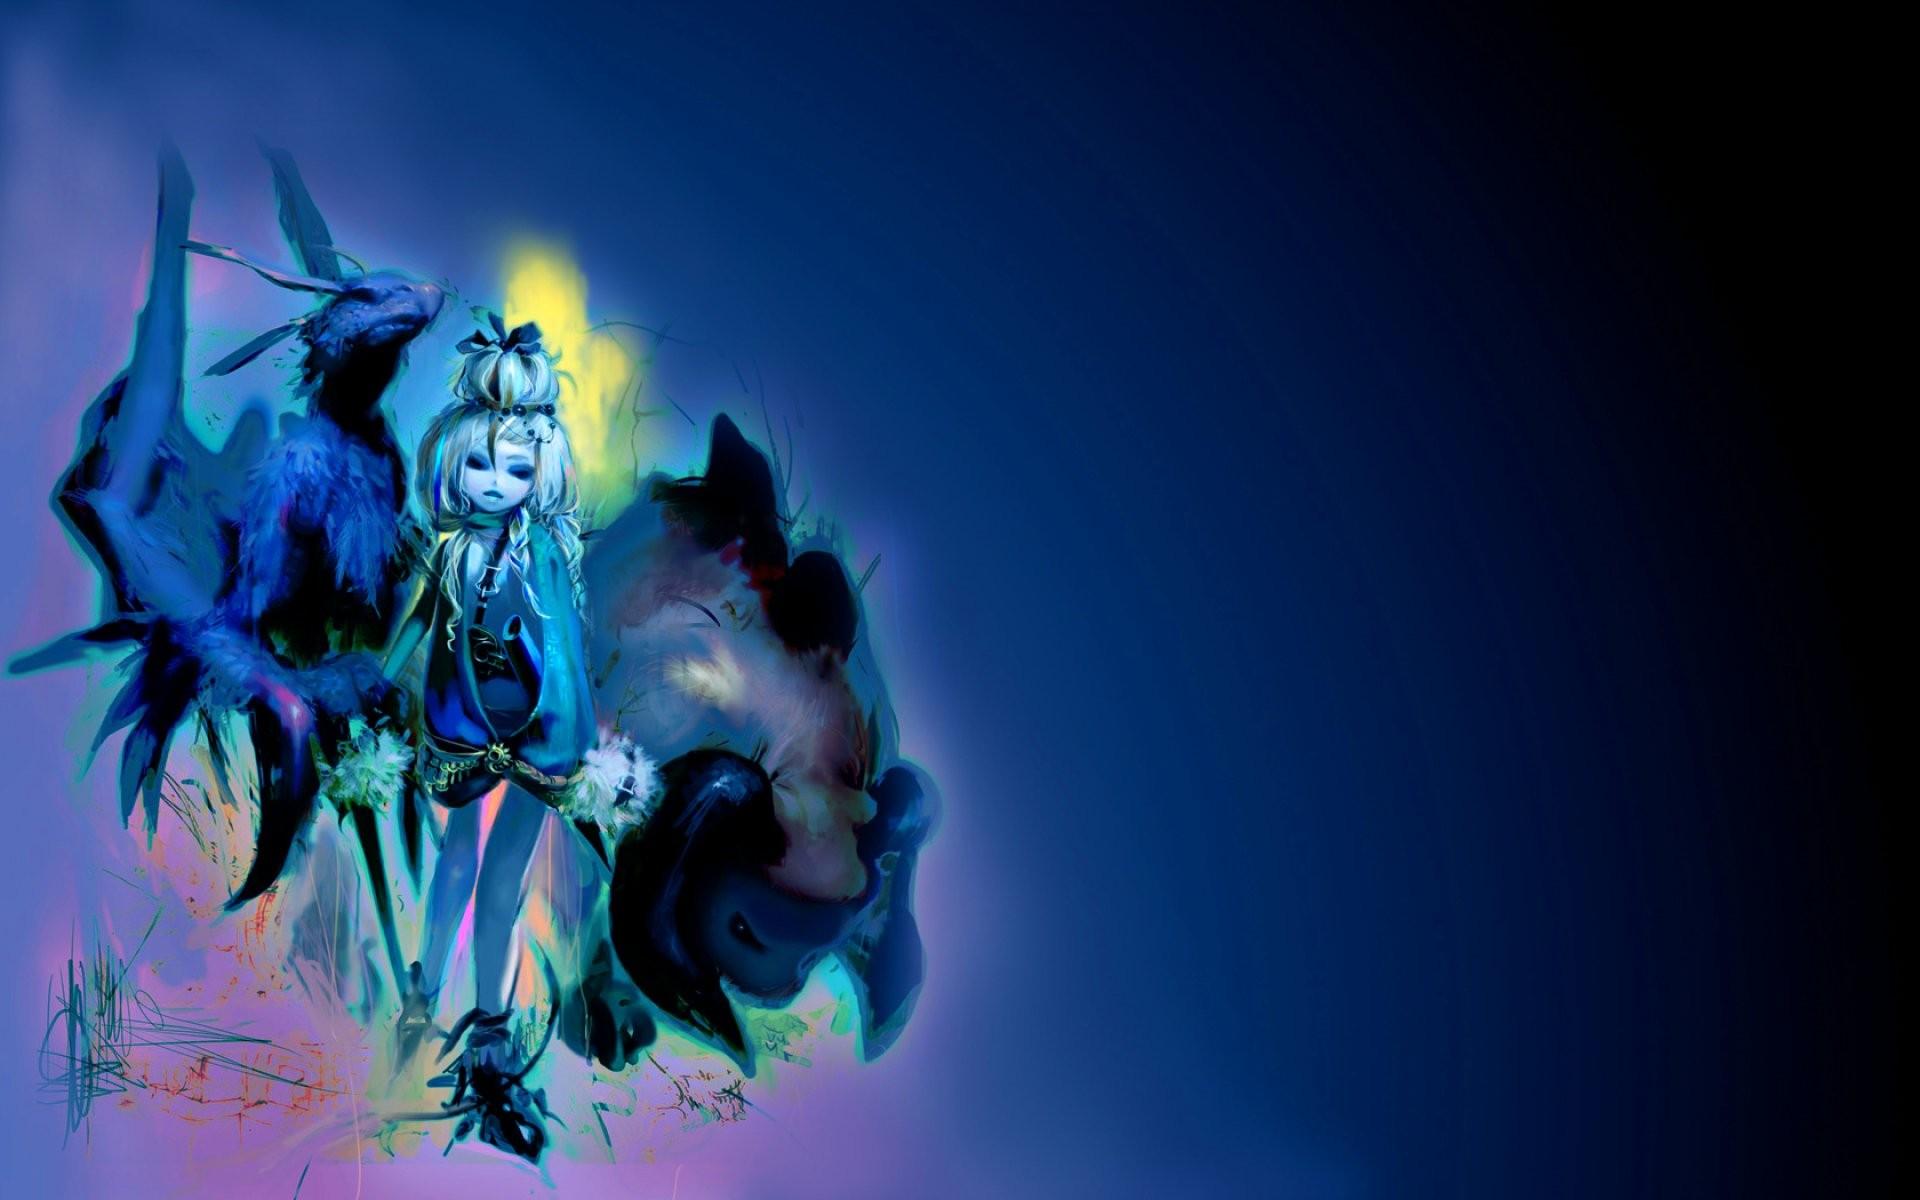 Scary,dark, Evil, Hd, Psychedelic, Artistic, Horror, - Illustration - HD Wallpaper